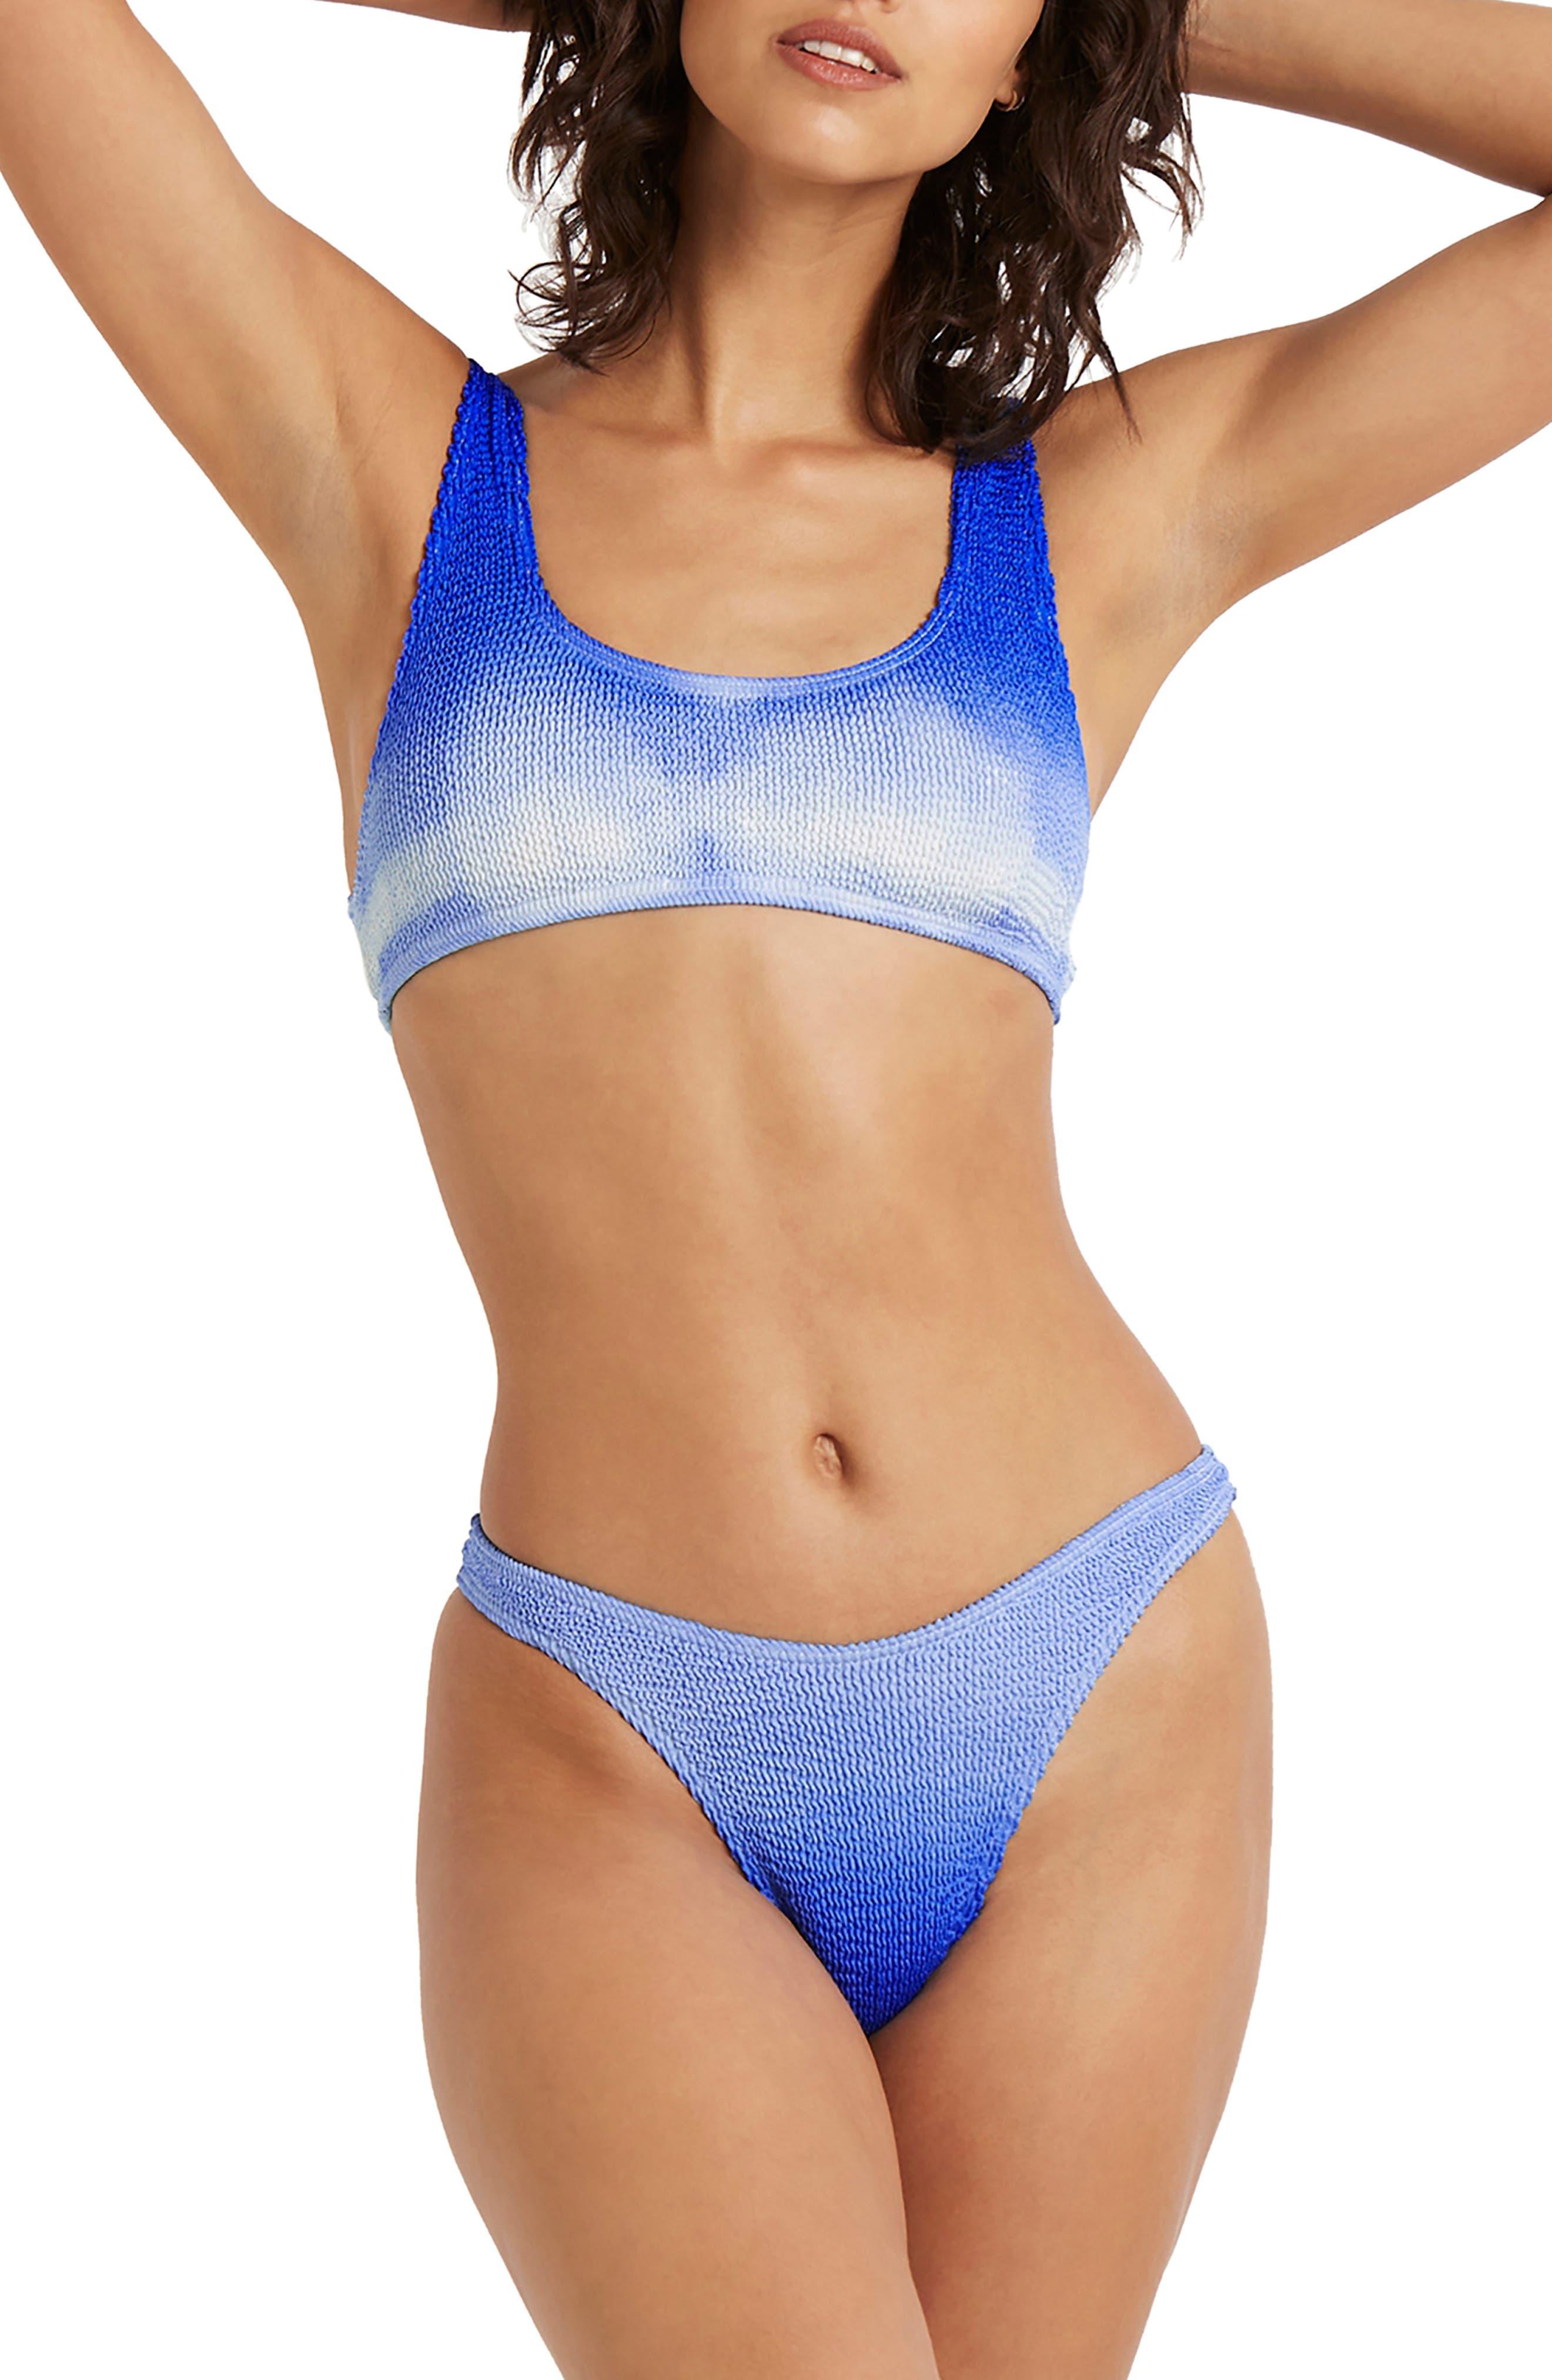 The Malibu Bikini in Bel Air Blue at Nordstrom